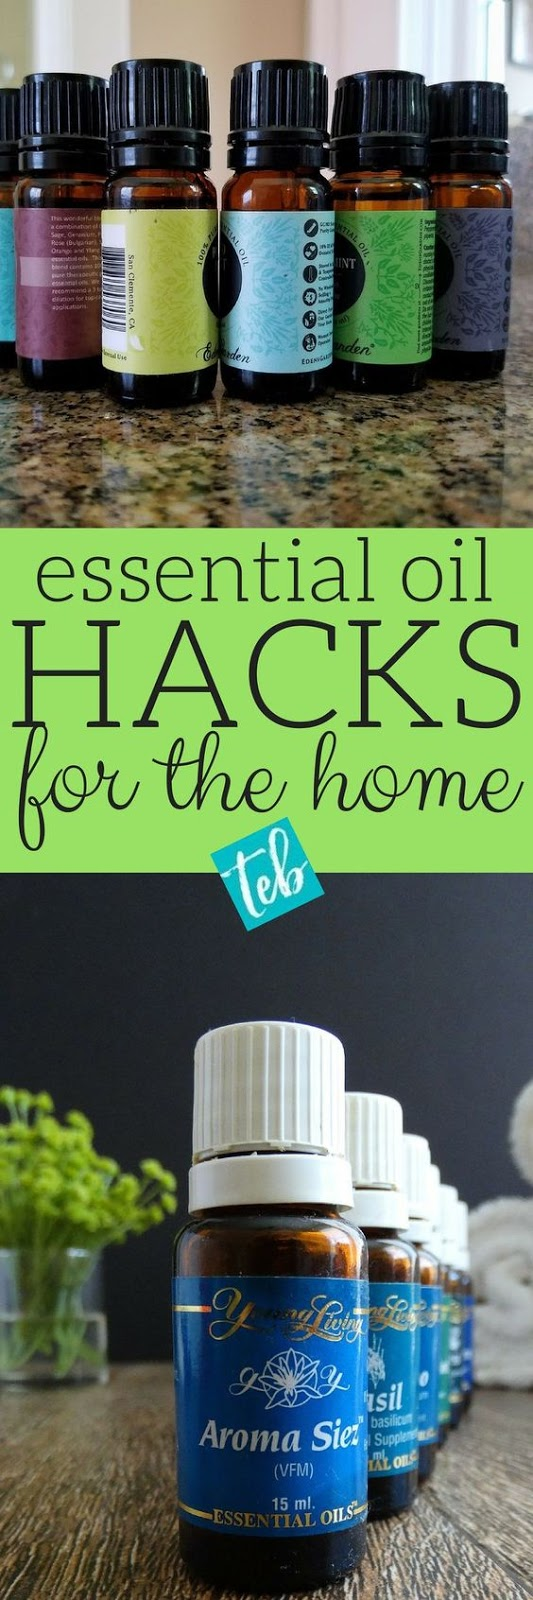 essential oil hacks tips tricks